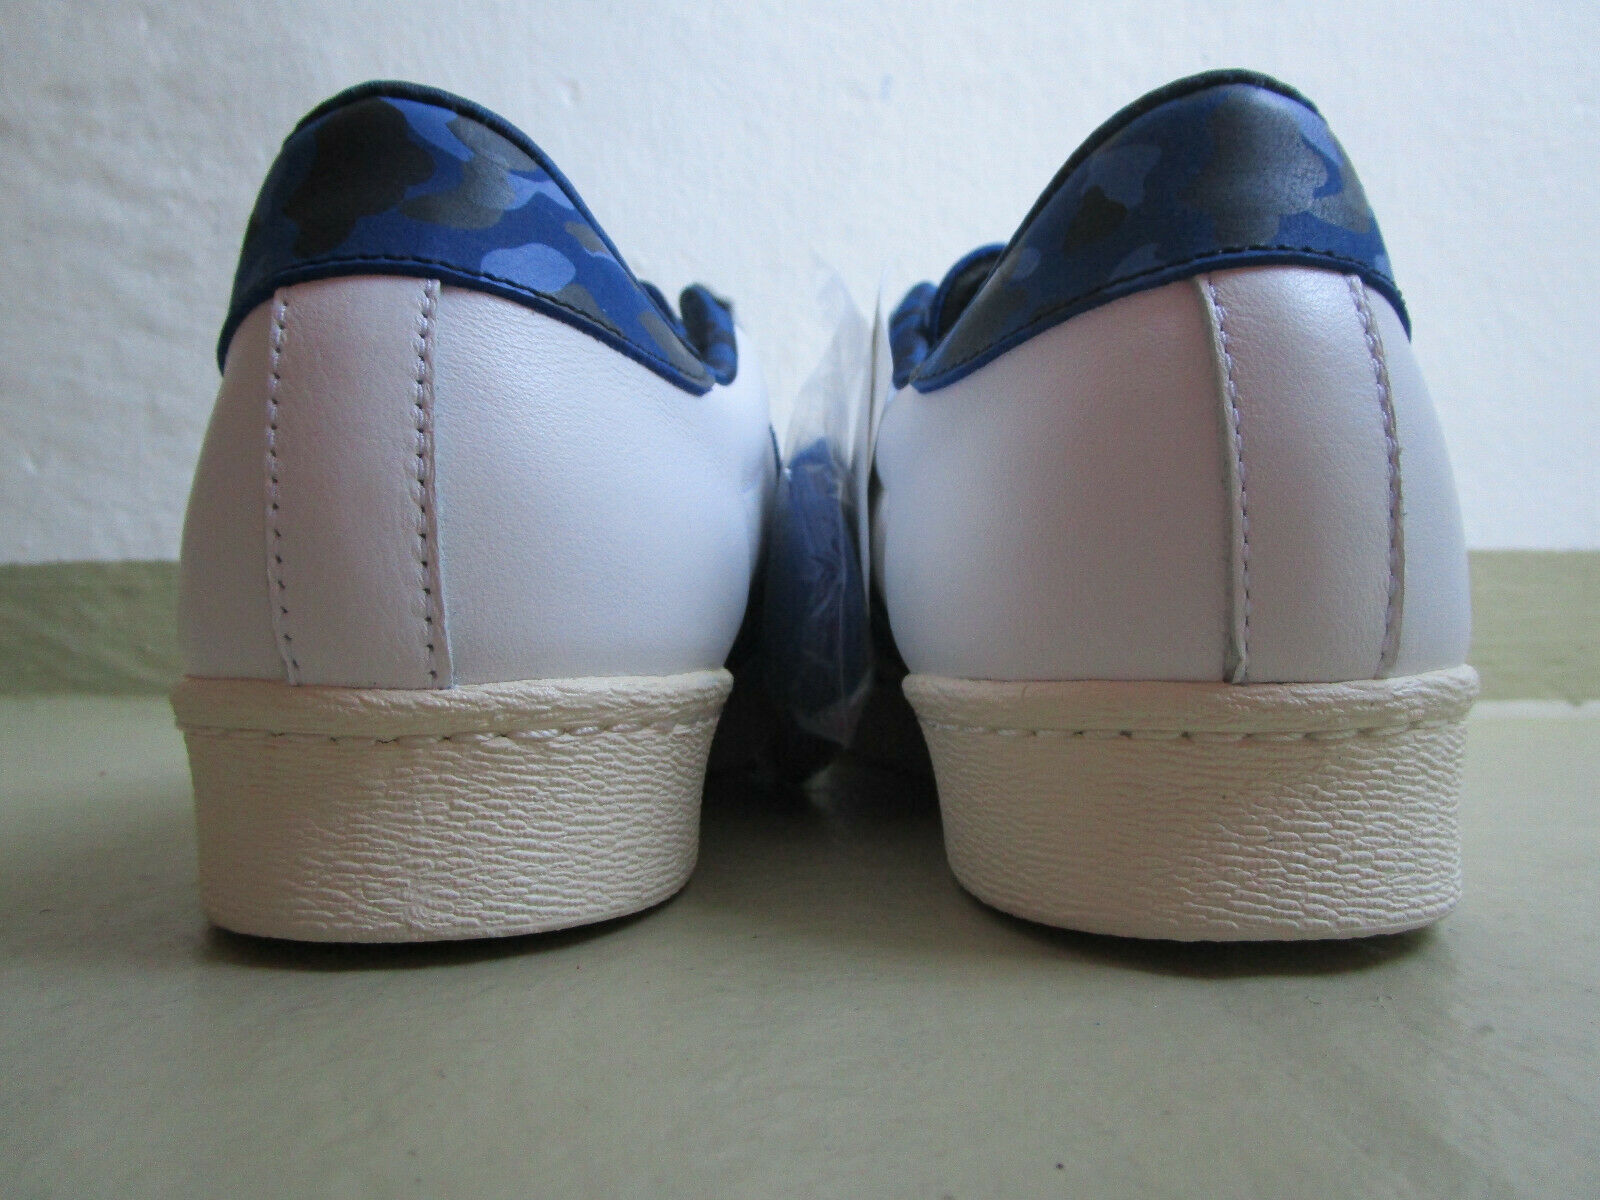 ADIDAS NMD_RACER PK schwarzrot, Herren Sneaker, Art. BD7728, NEU im Karton